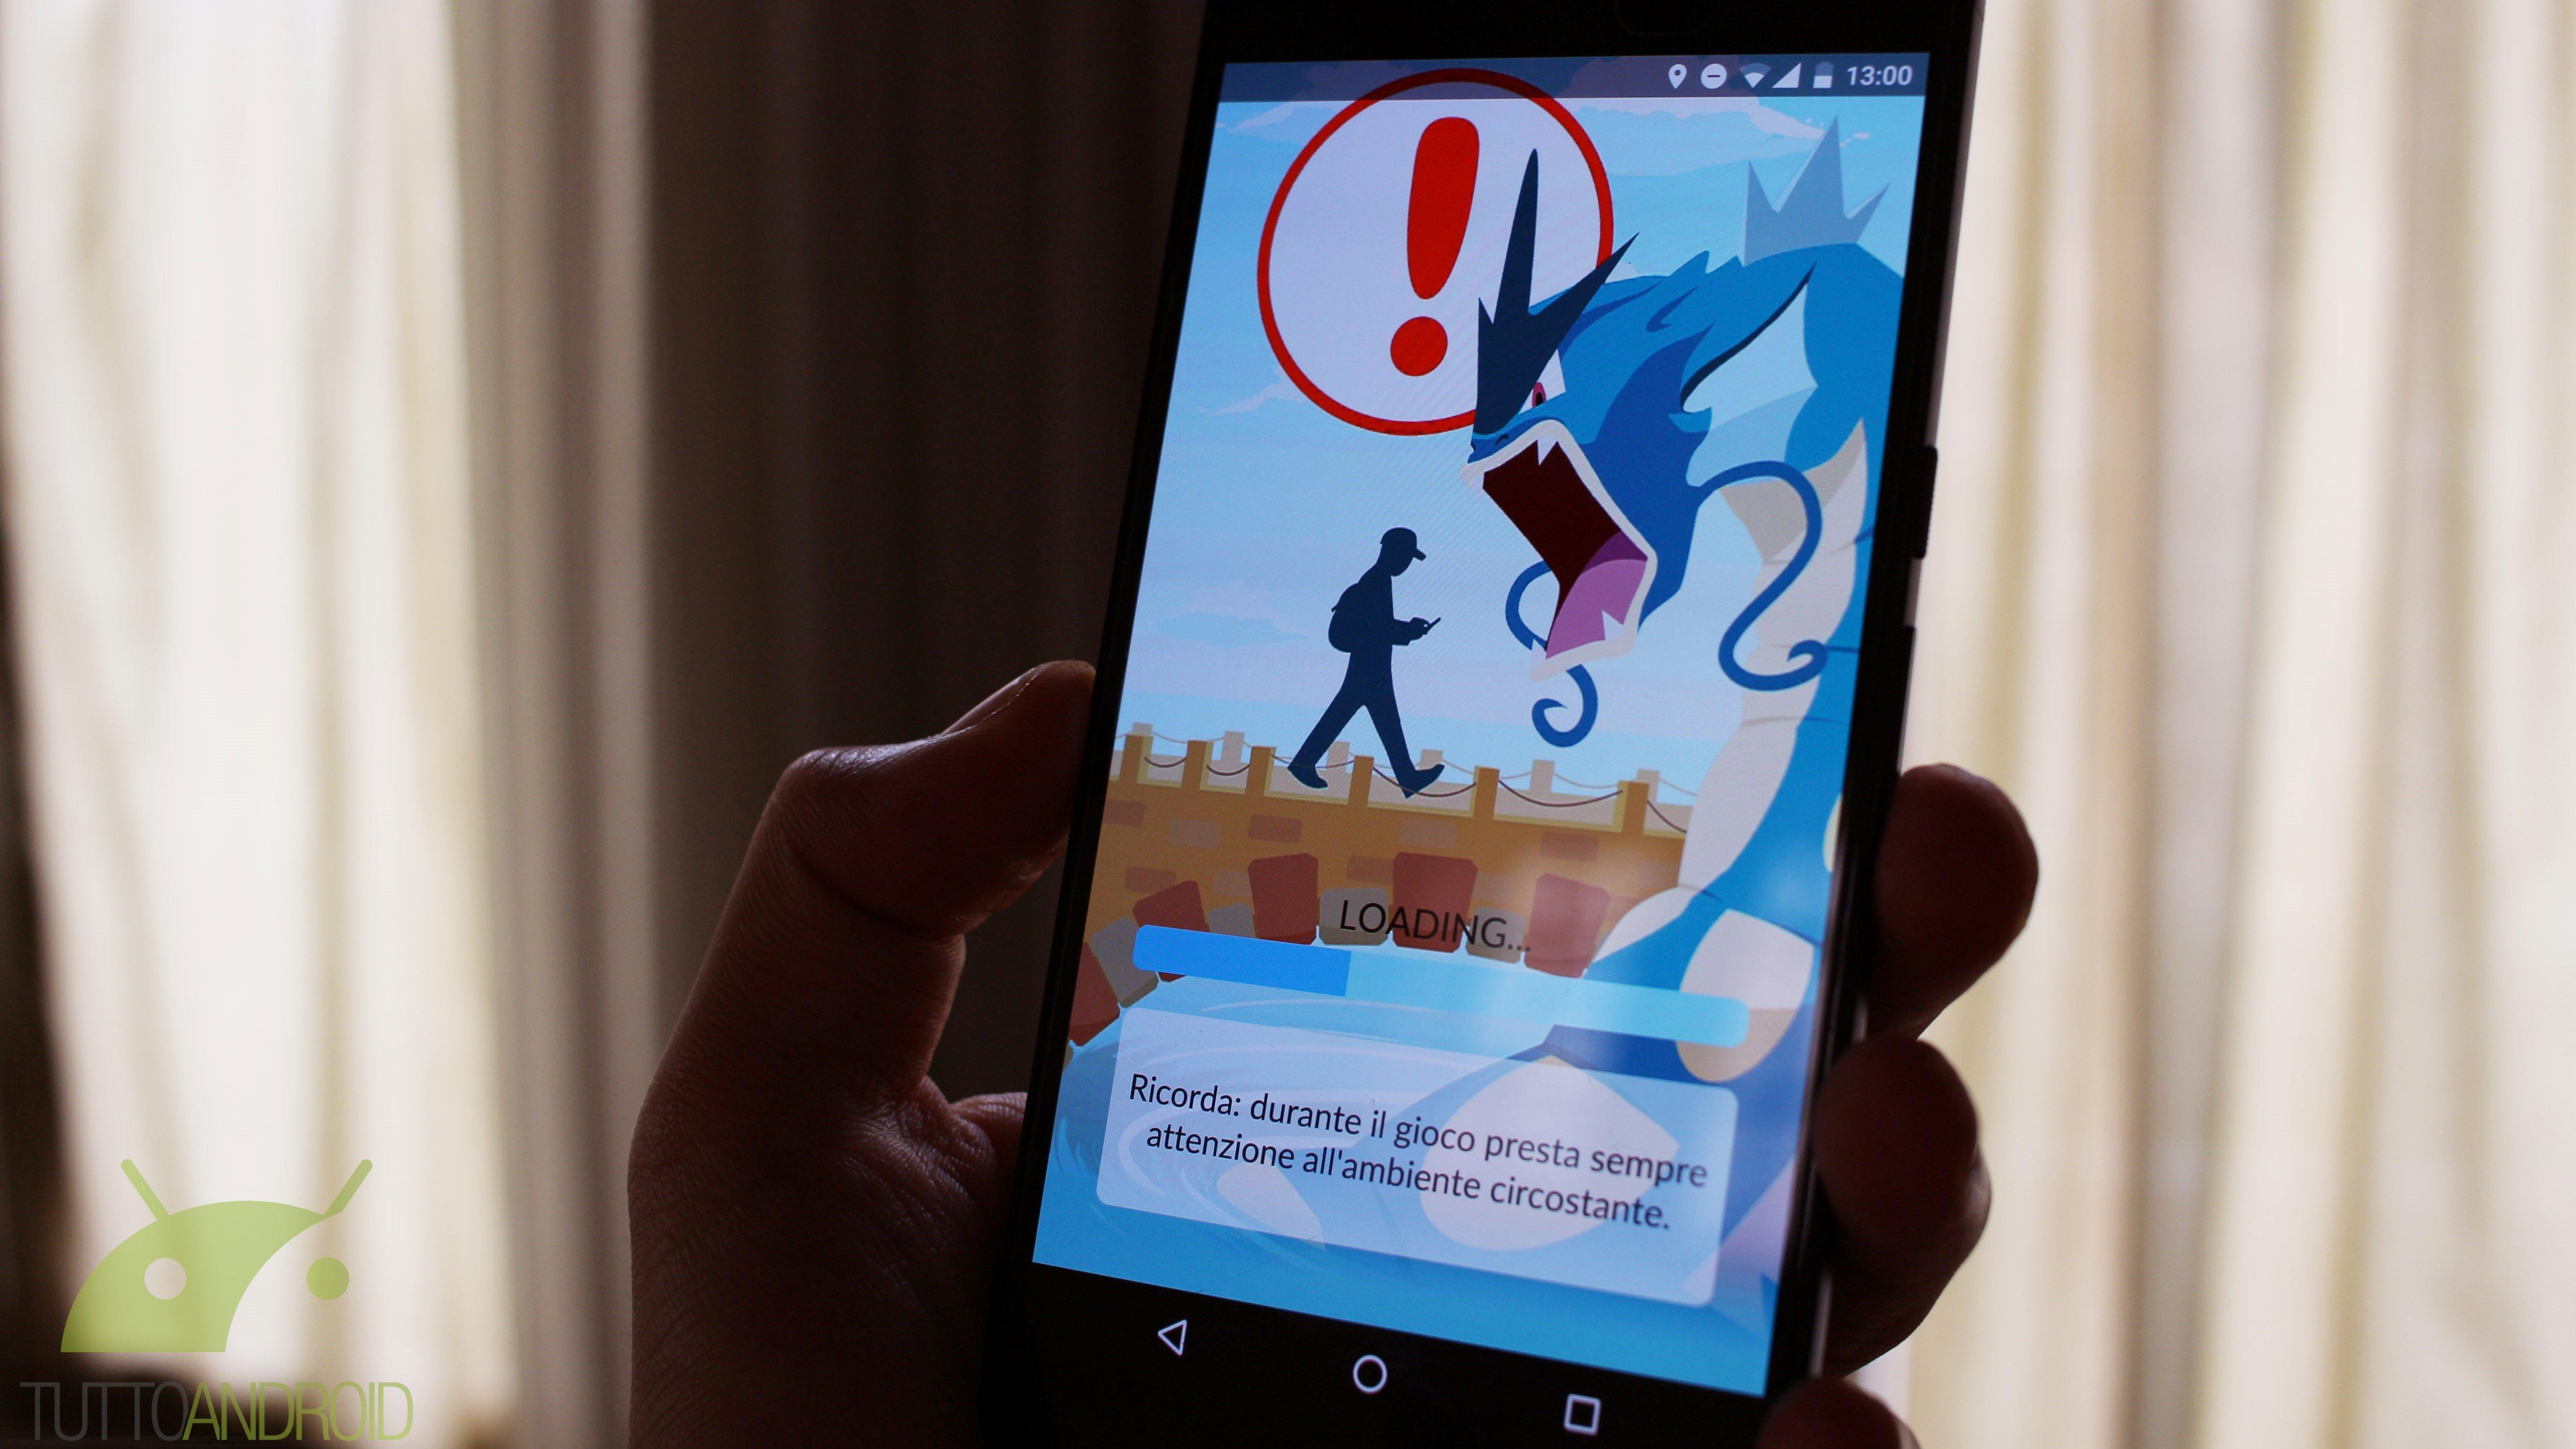 Nintendo e niantics introducono il ban permanente su pokémon go per